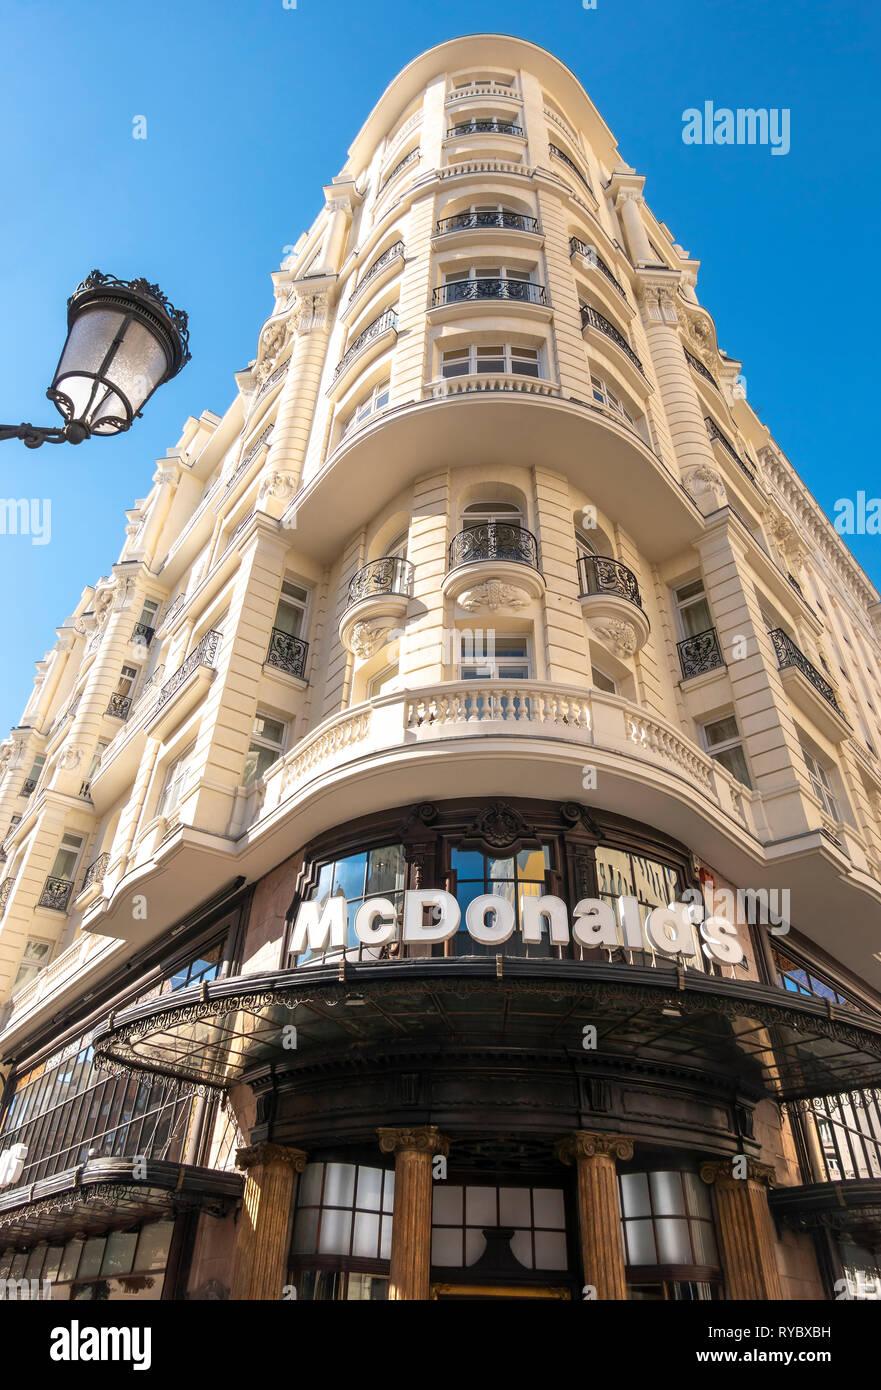 https://c7.alamy.com/comp/RYBXBH/mcdonalds-restaurant-on-the-corner-of-gran-via-and-calle-de-la-montera-in-madrid-spain-europe-RYBXBH.jpg